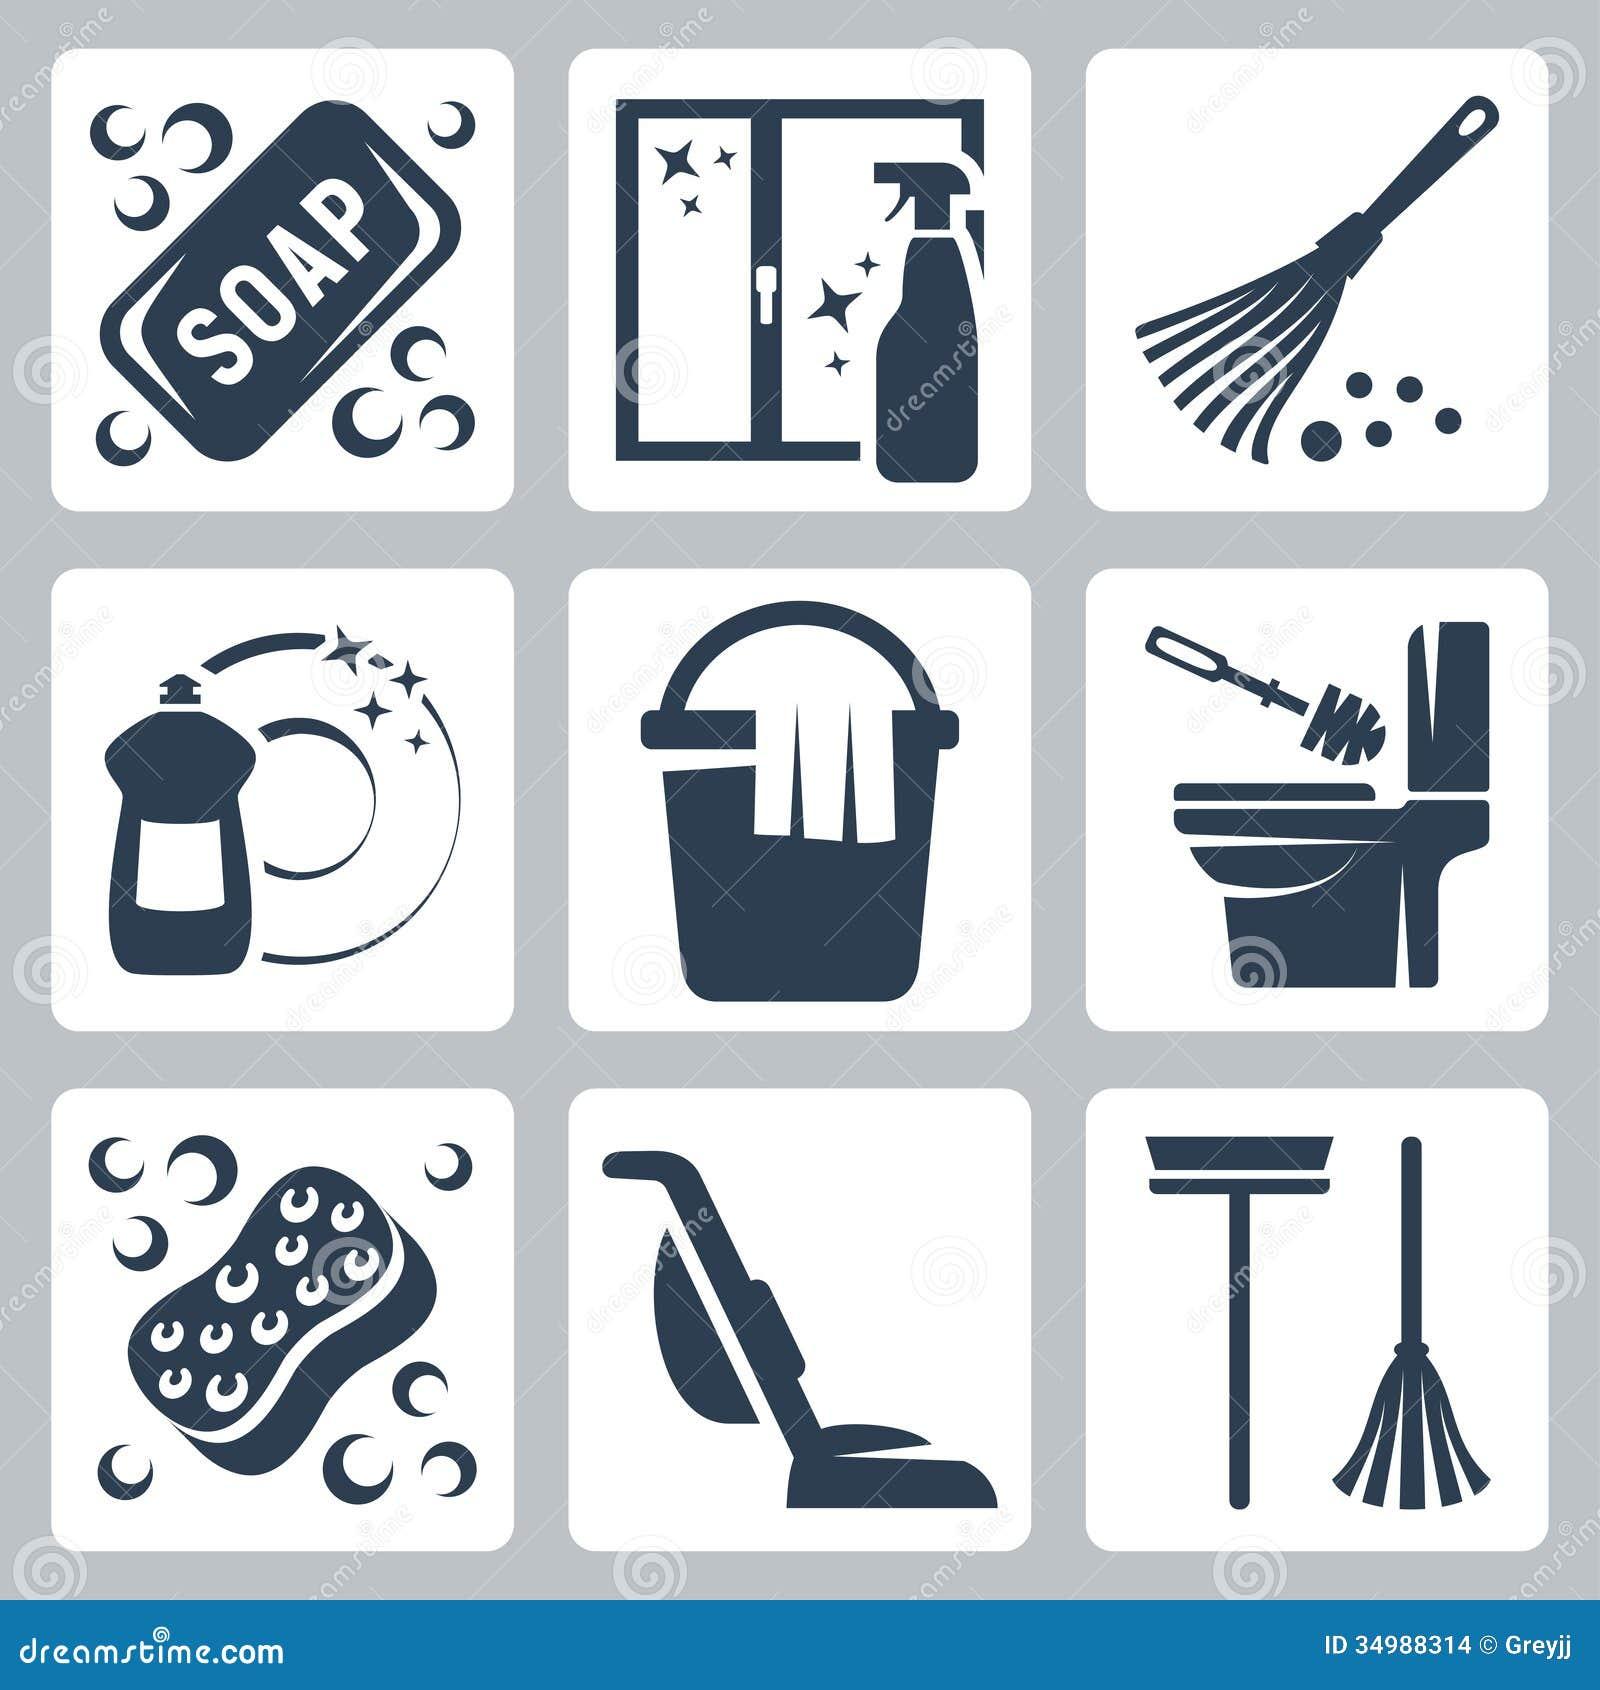 #84A427 da limpeza do vetor ajustados: sabão líquido de limpeza de janela  824 Limpeza Janelas Vidros